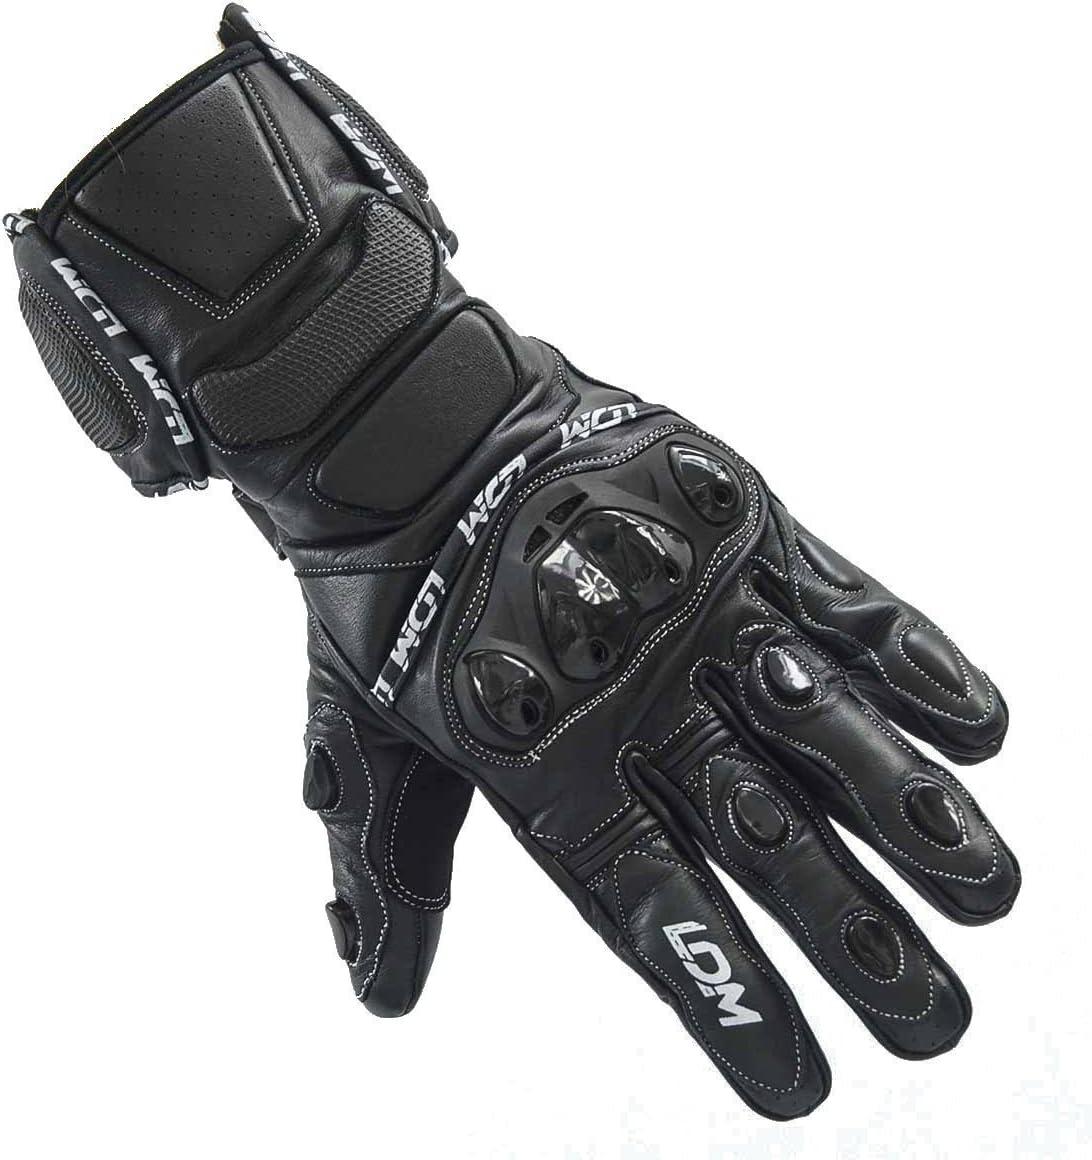 Guantes de piel para motocicleta color negro LDM Street-R